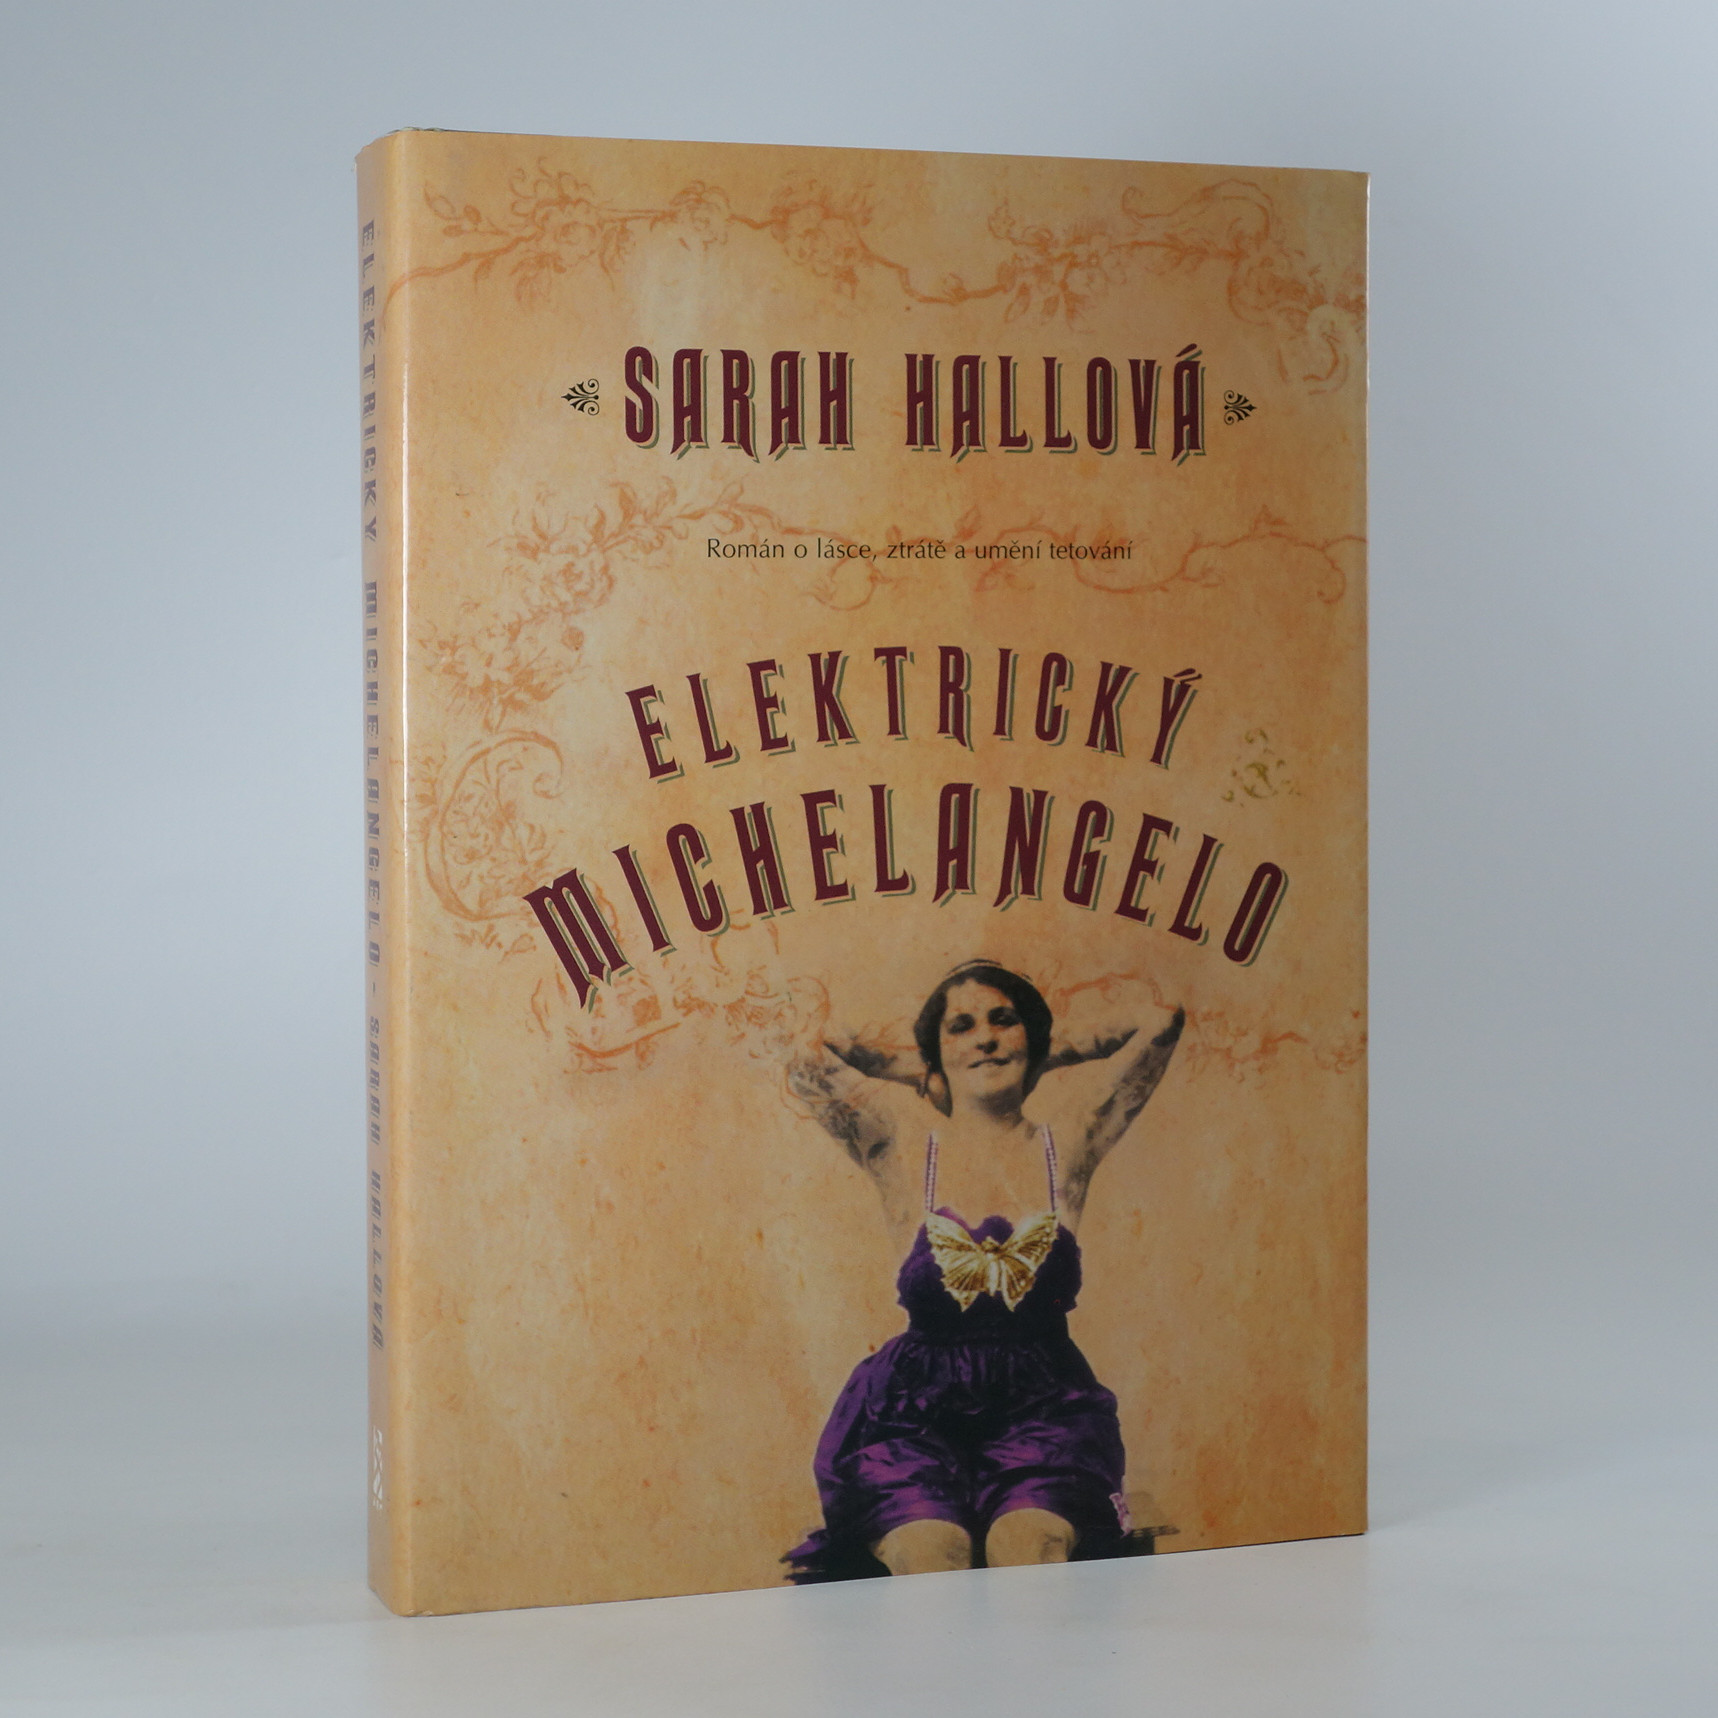 antikvární kniha Elektrický Michelangelo, 2005